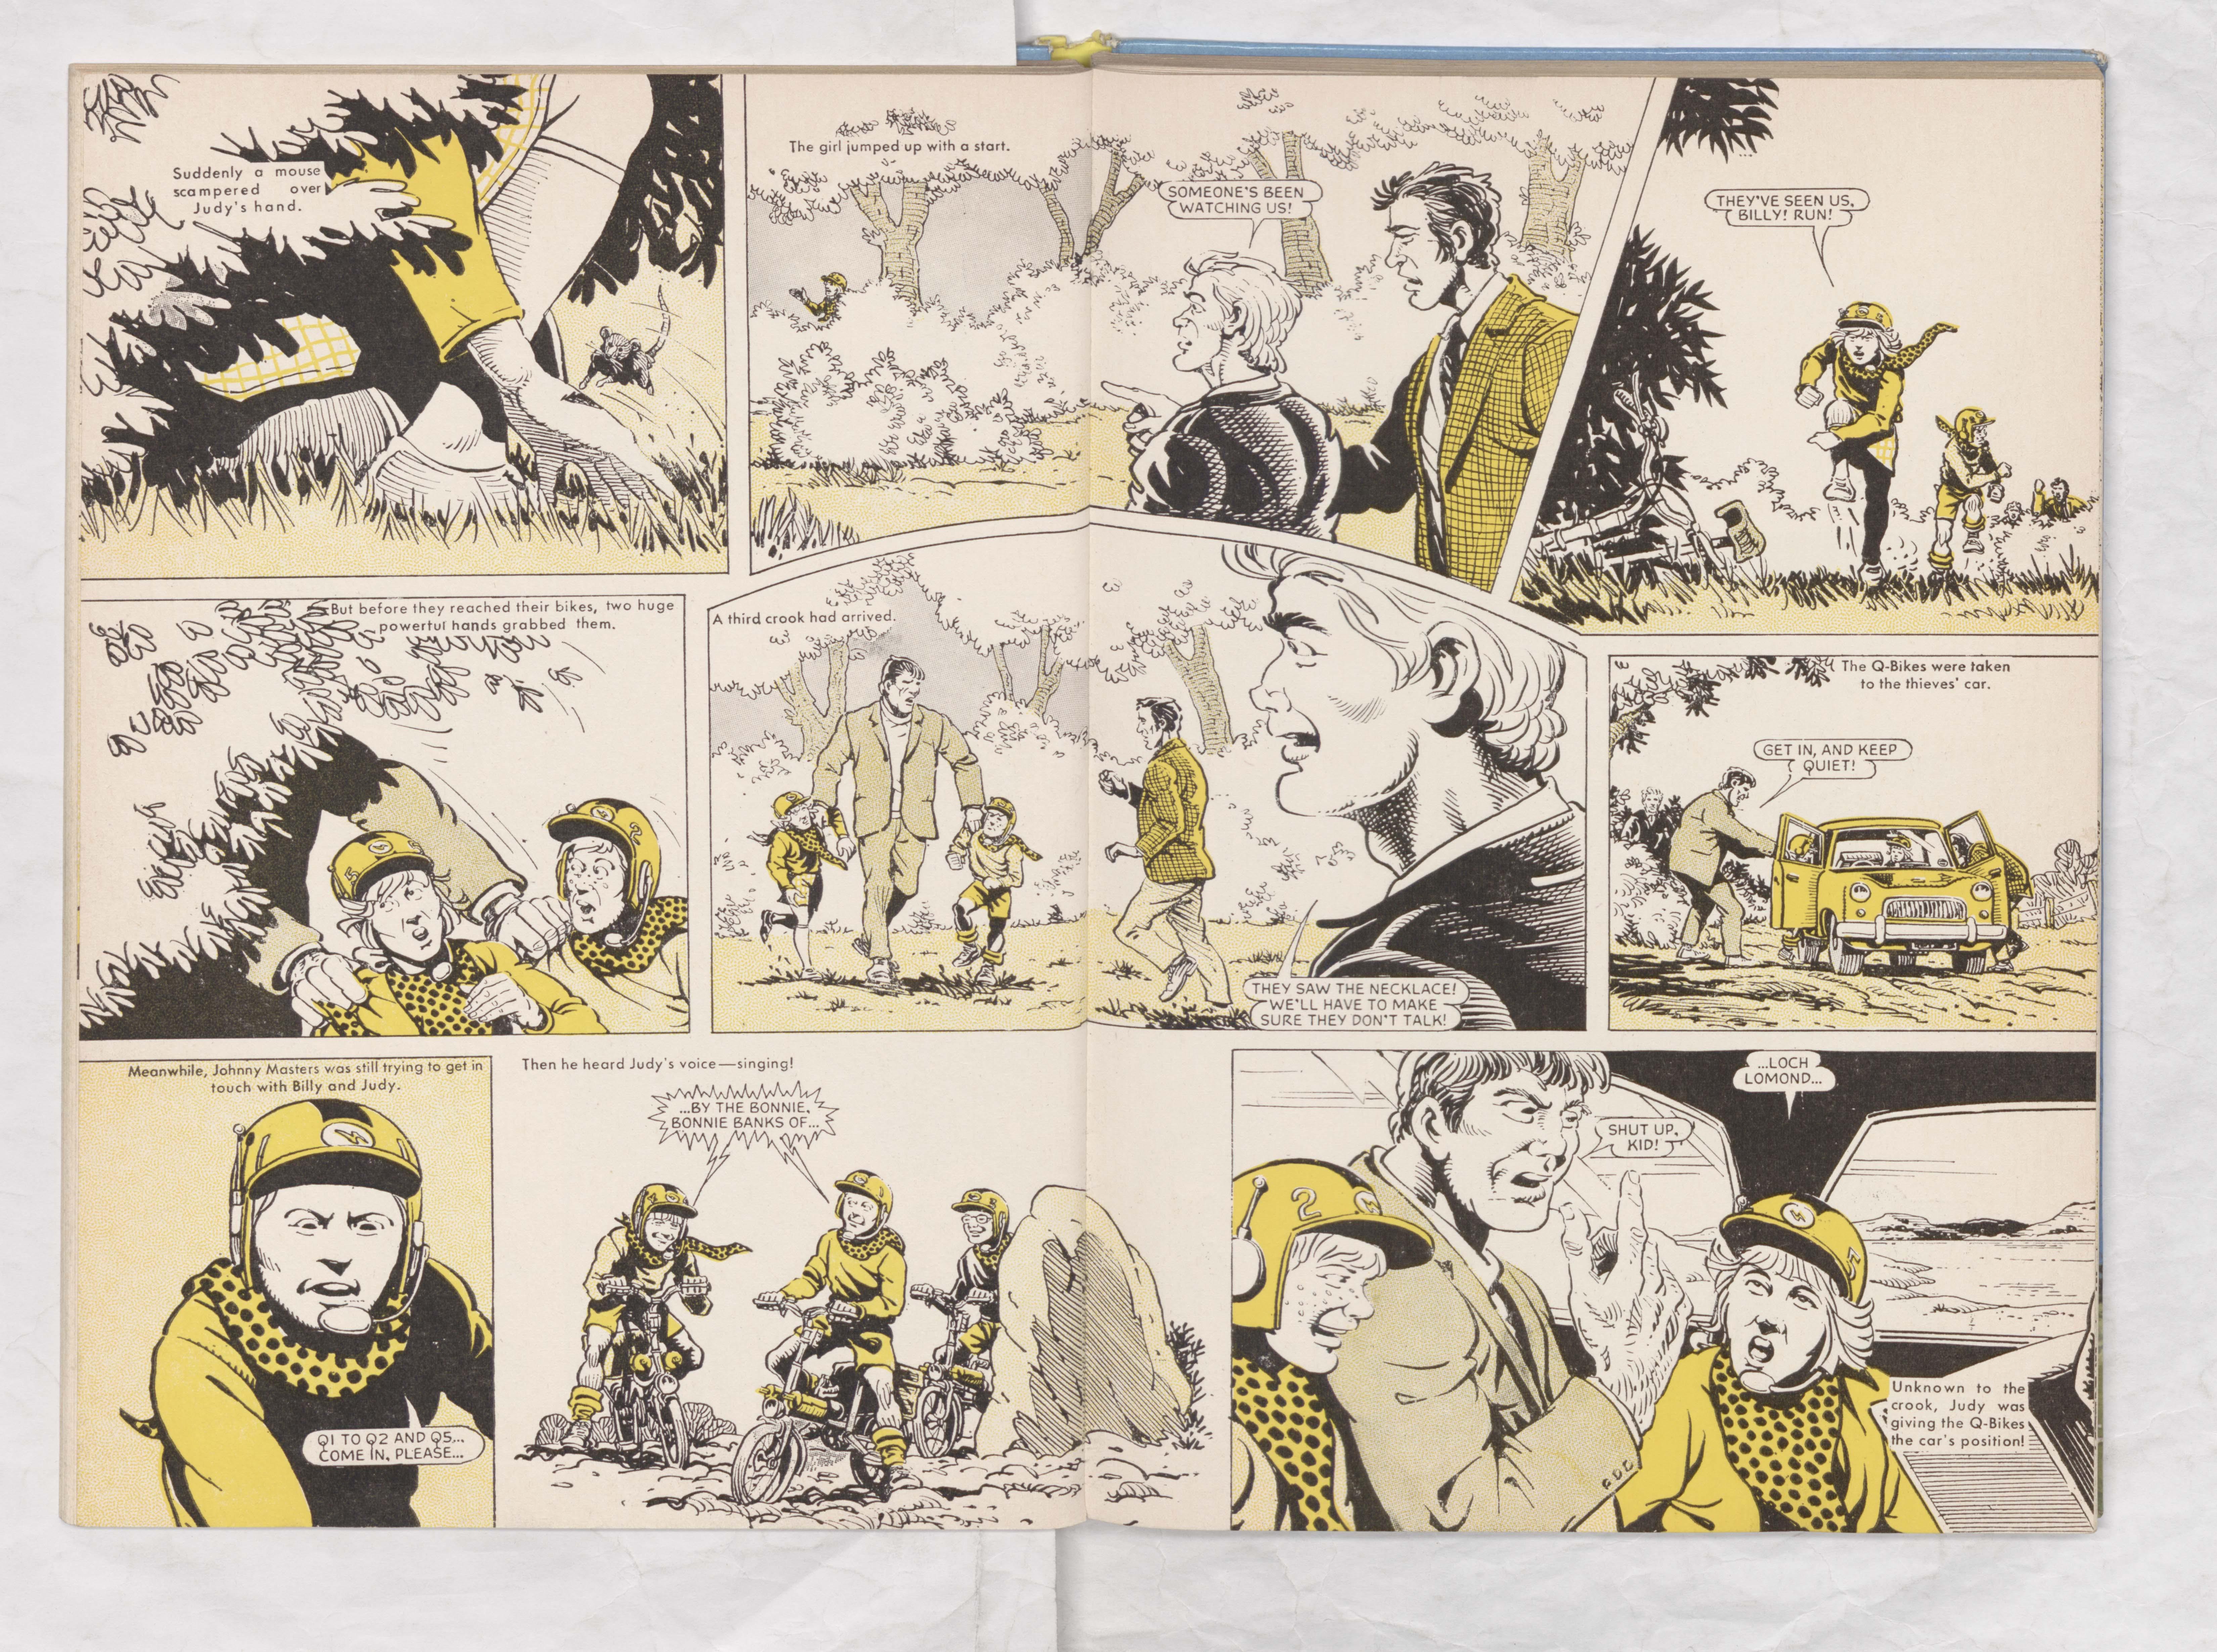 Beano Book 1970 - Q-Bikes - Page 4 + 5